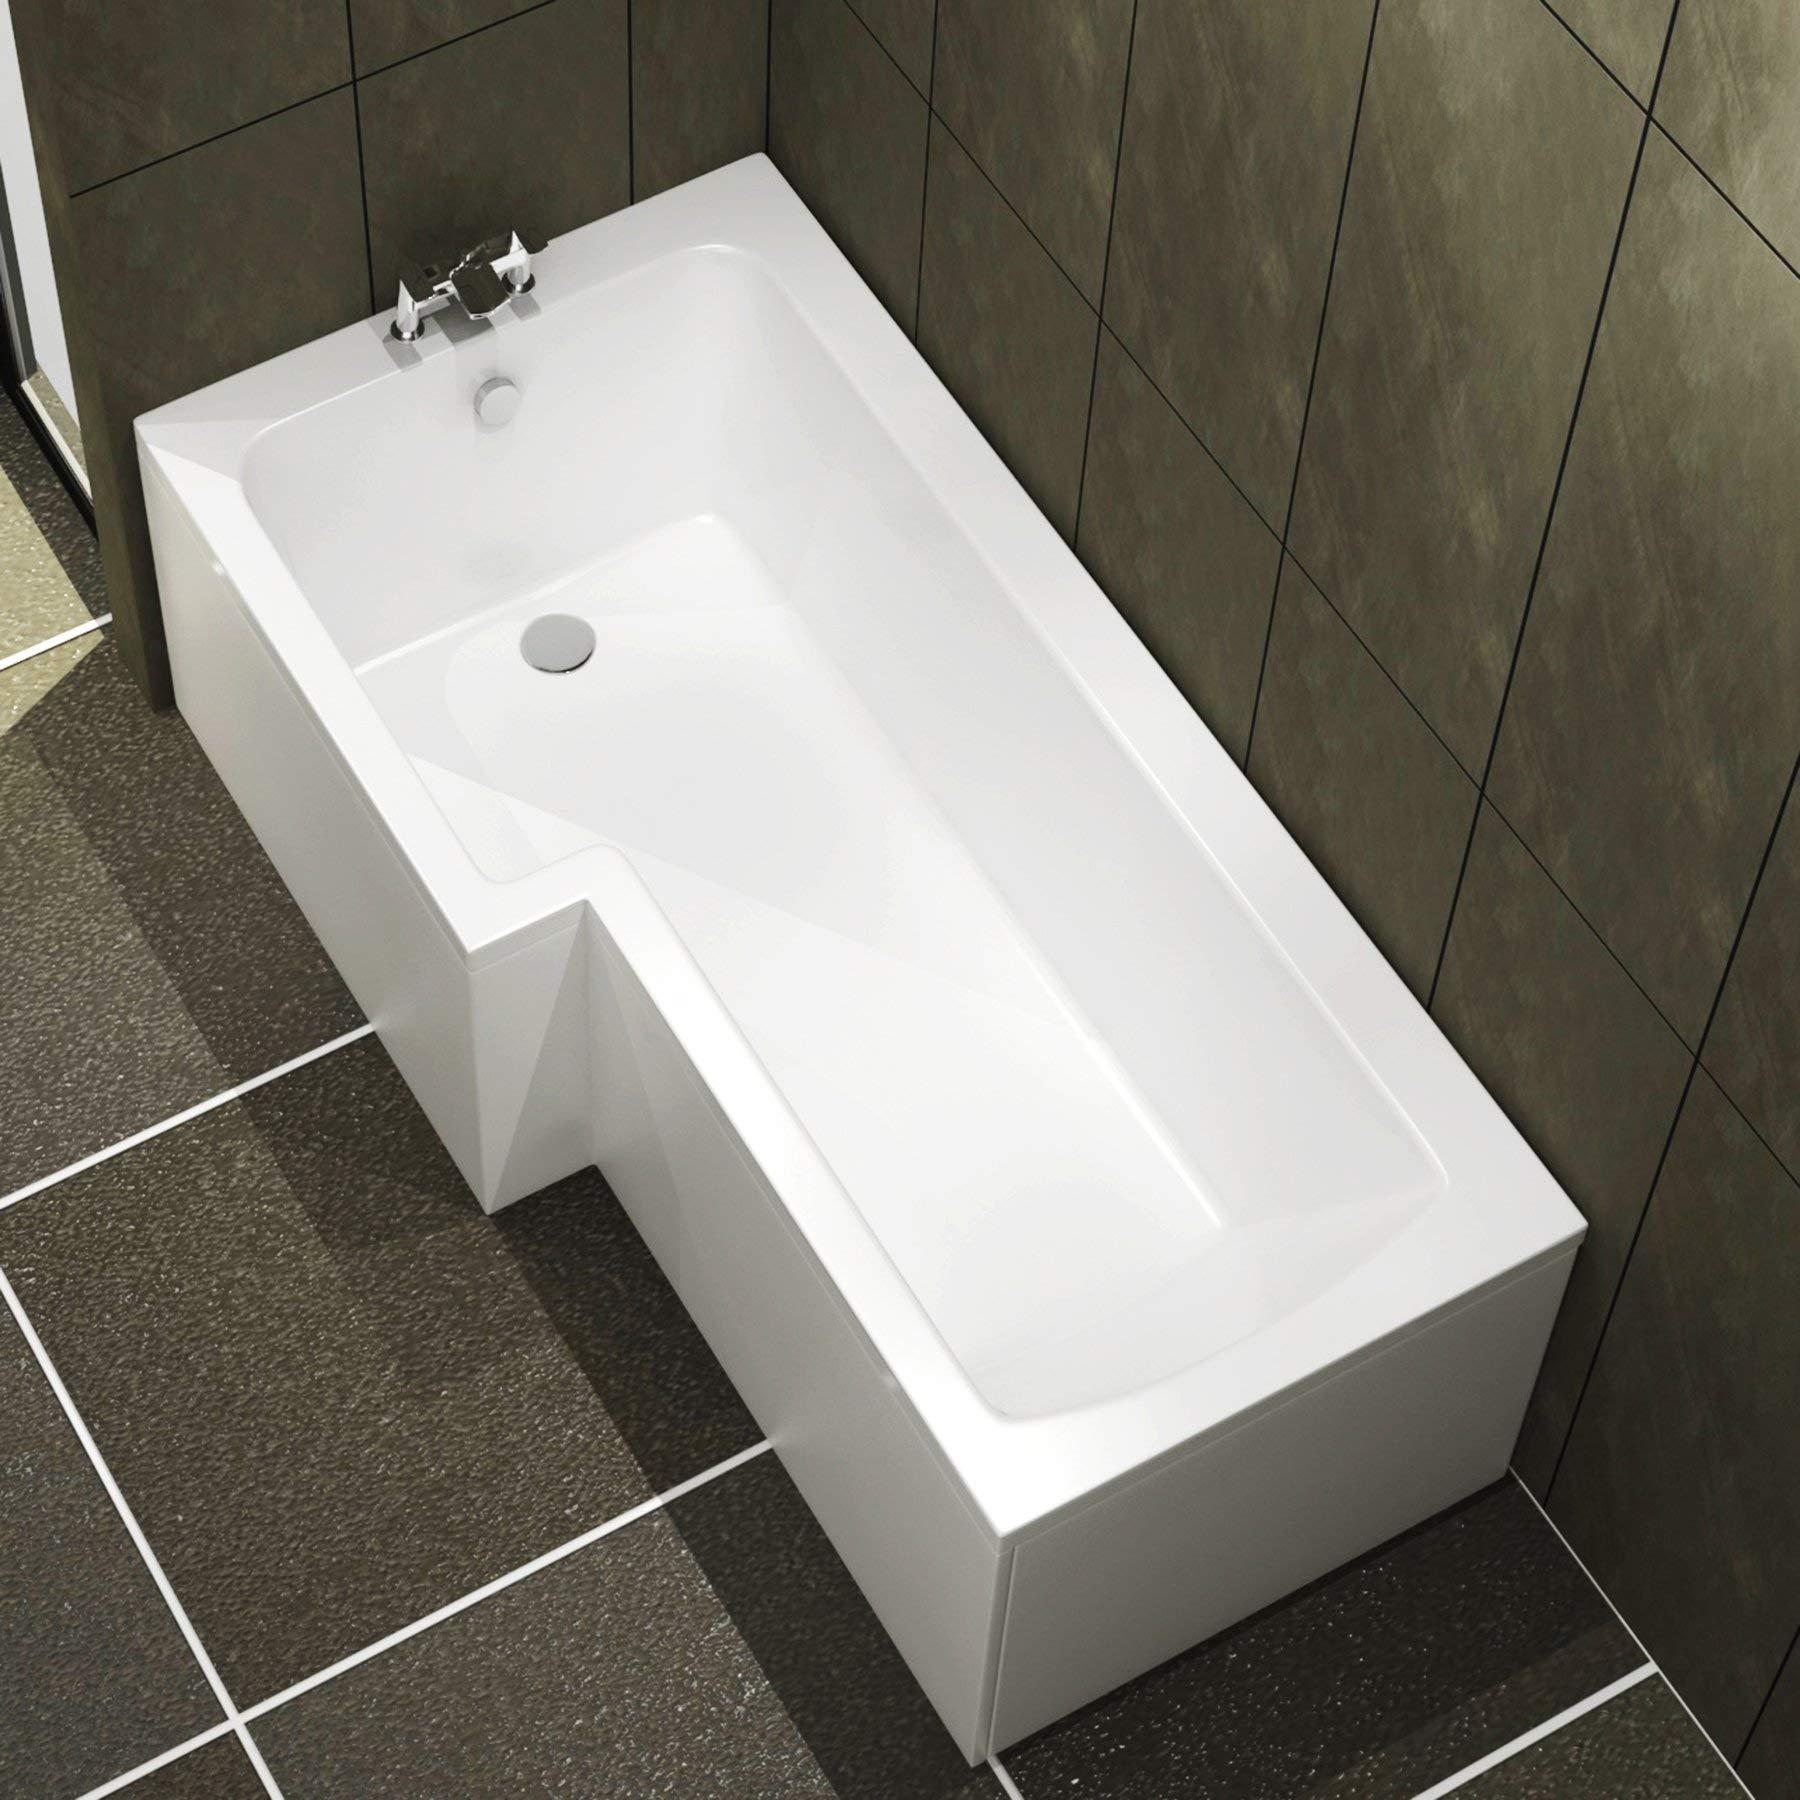 Qubix 1500 x 850mm Left Hand L-Shaped Shower Bath Bathtub with Front Panel Glass Shower Screen